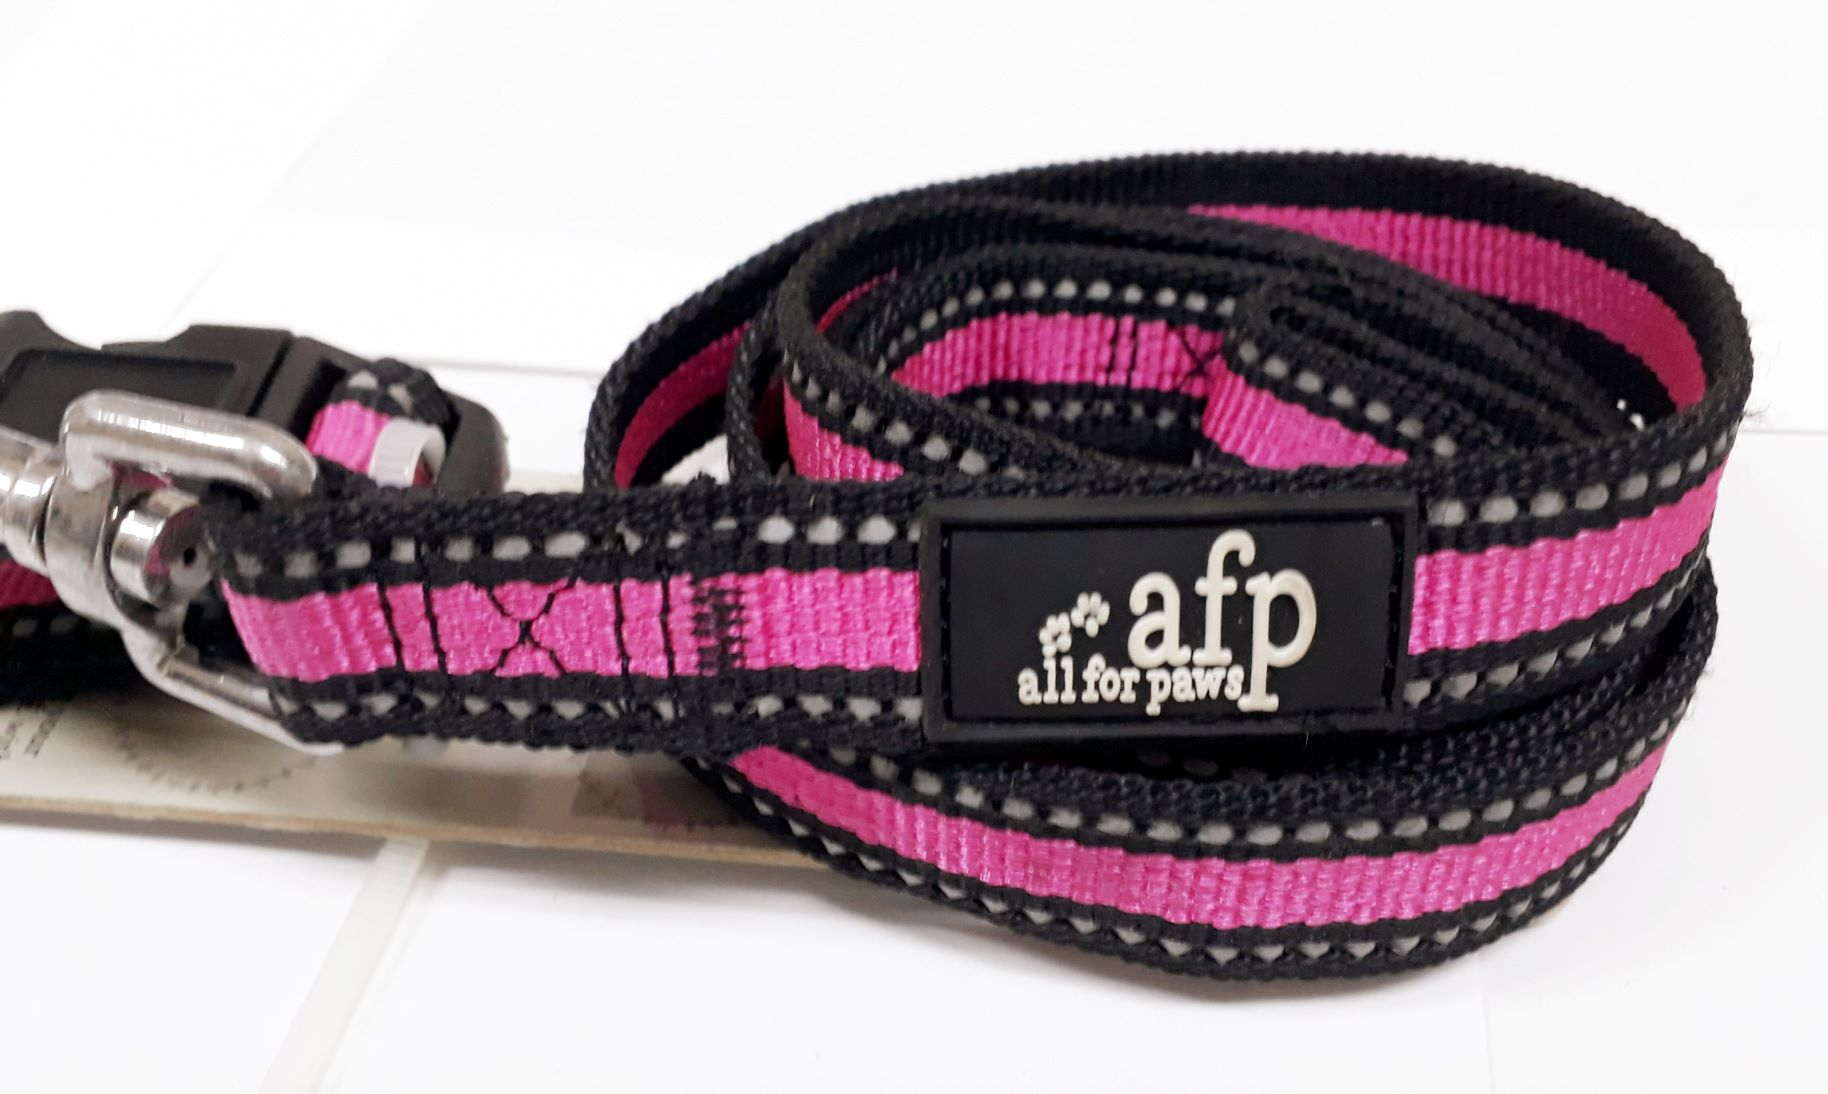 Coleira E Guia Fluorescente Afp Pink G